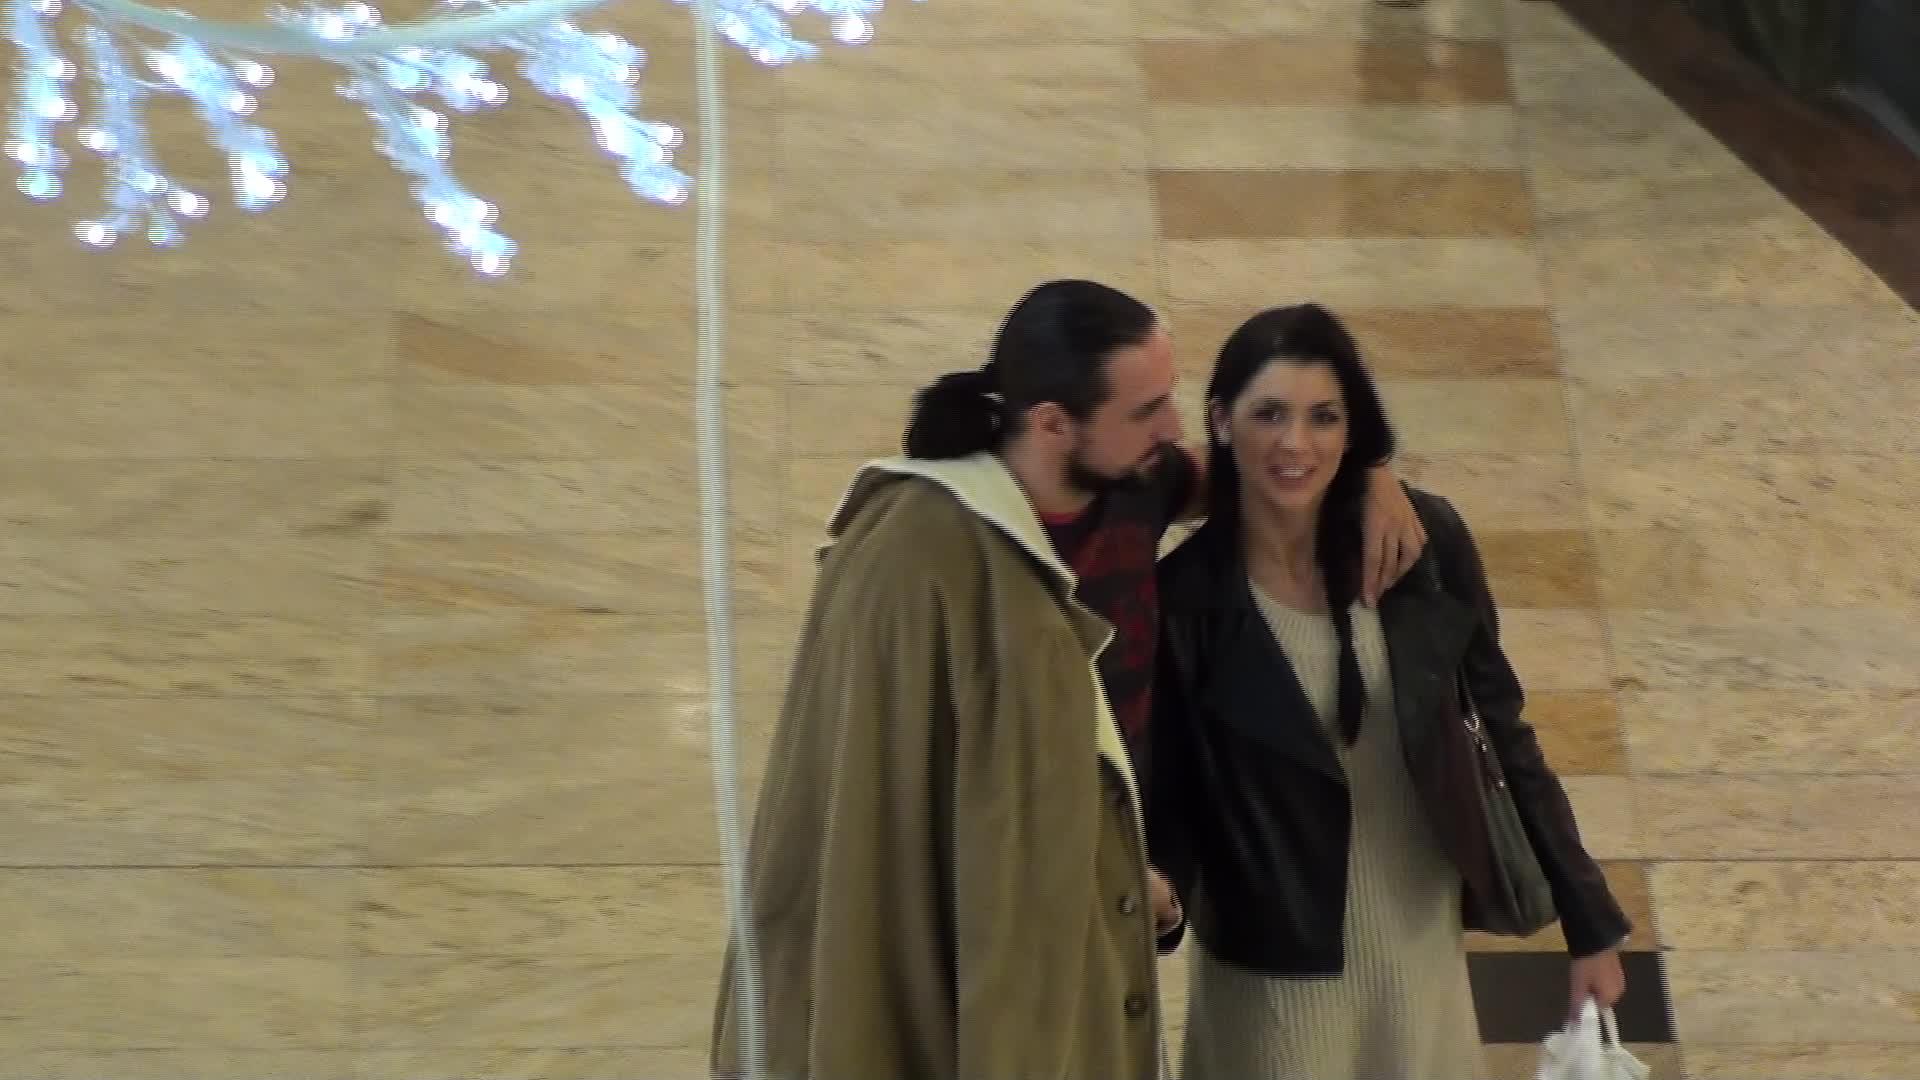 Denis si Cristina sunt extrem de tandri si nu se feresc deloc sa faca astfel de gesturi in public